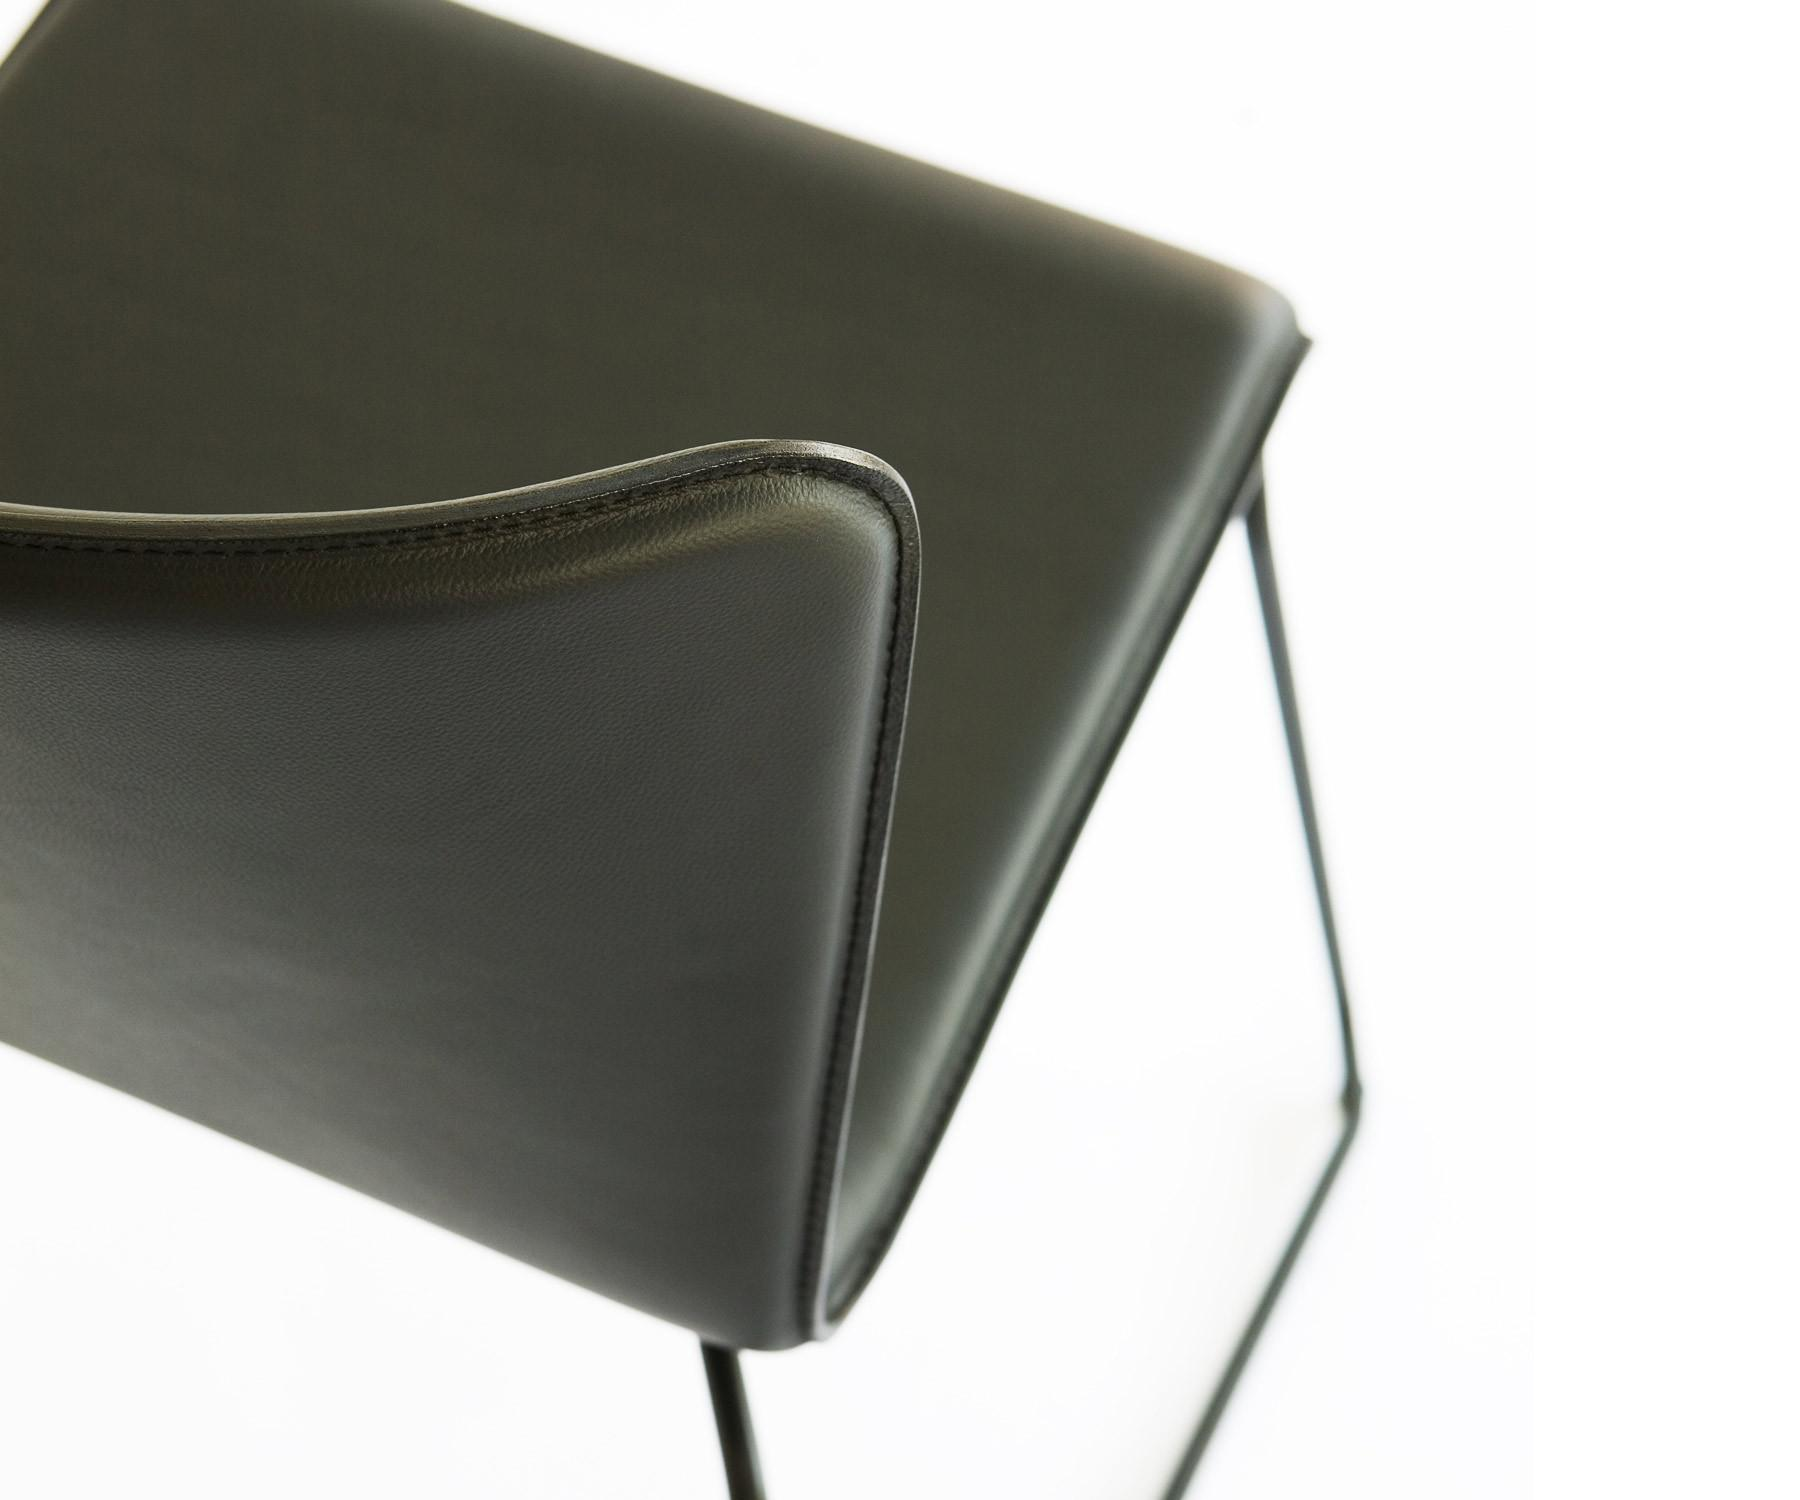 sphaus lisbon stuhl mit polsterung schwarz rot. Black Bedroom Furniture Sets. Home Design Ideas